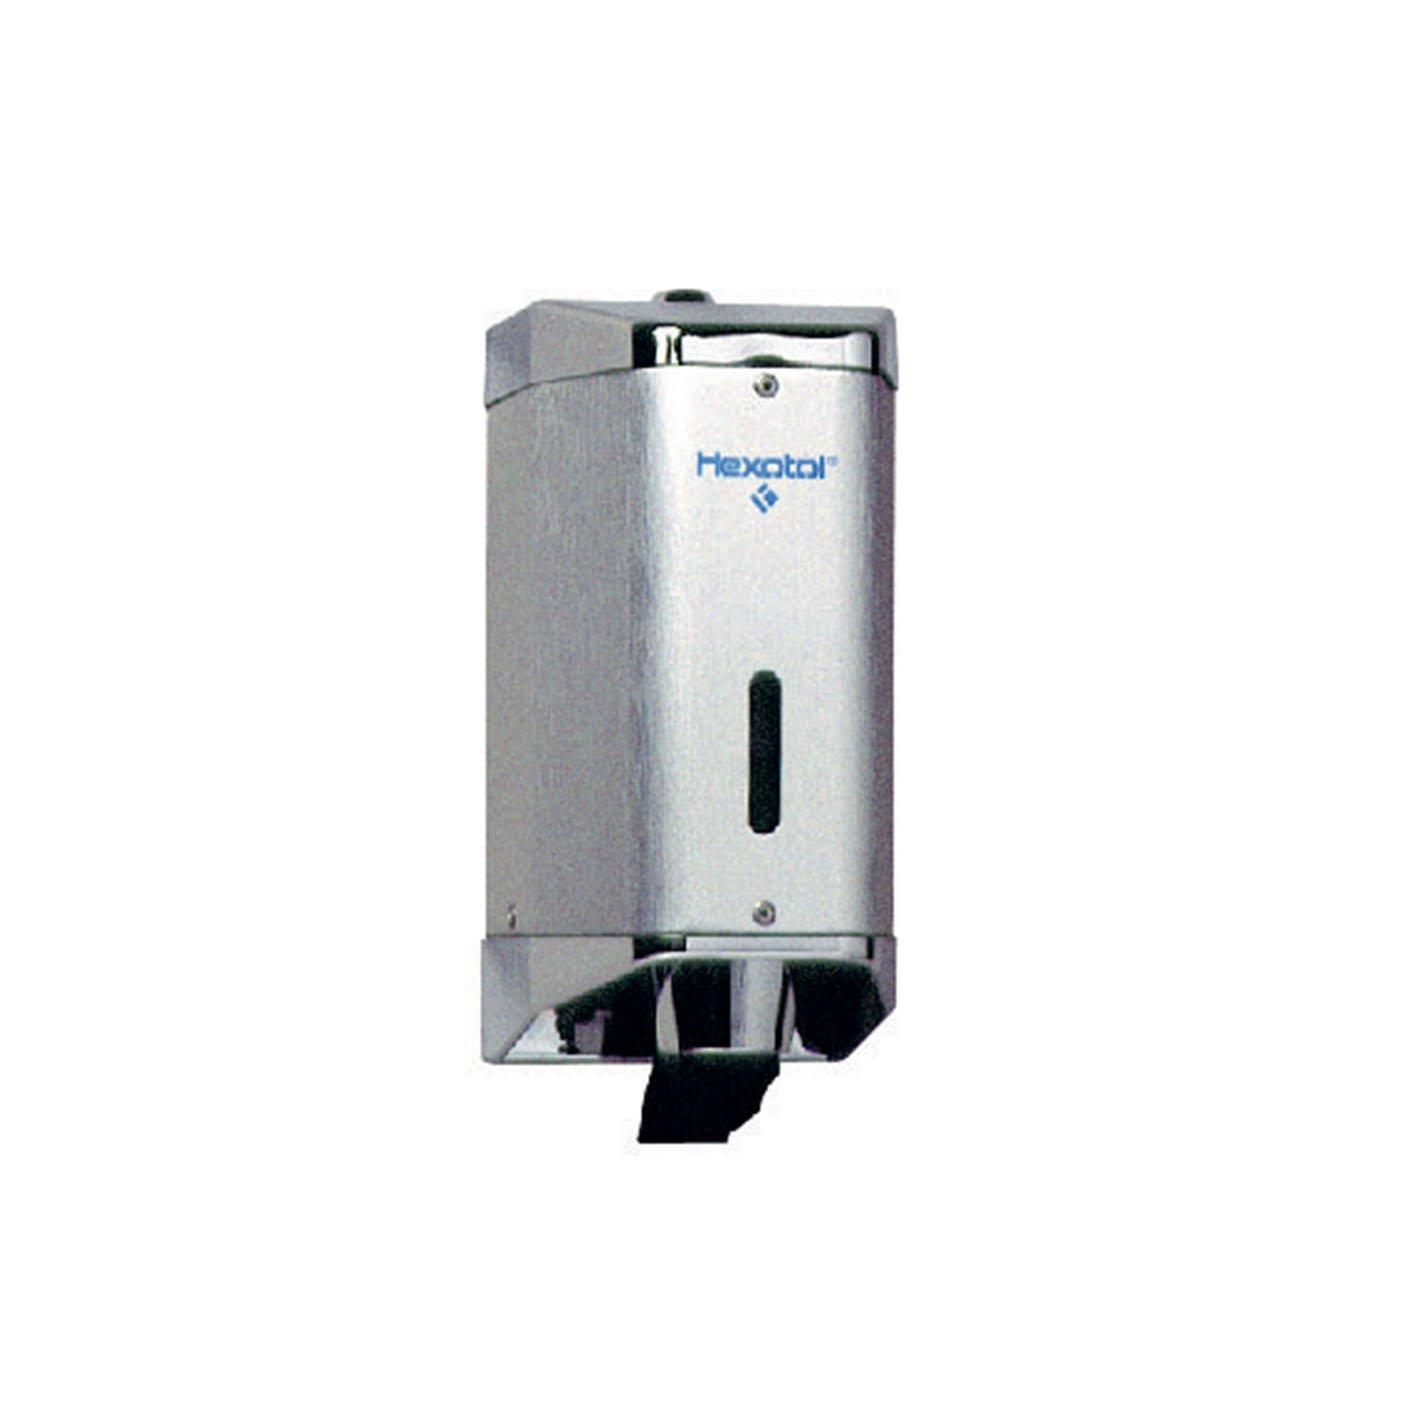 Hexotol CN803 Distributeur de Savon Aluminium Bross/é 11,6 X 10 X 22,5 cm